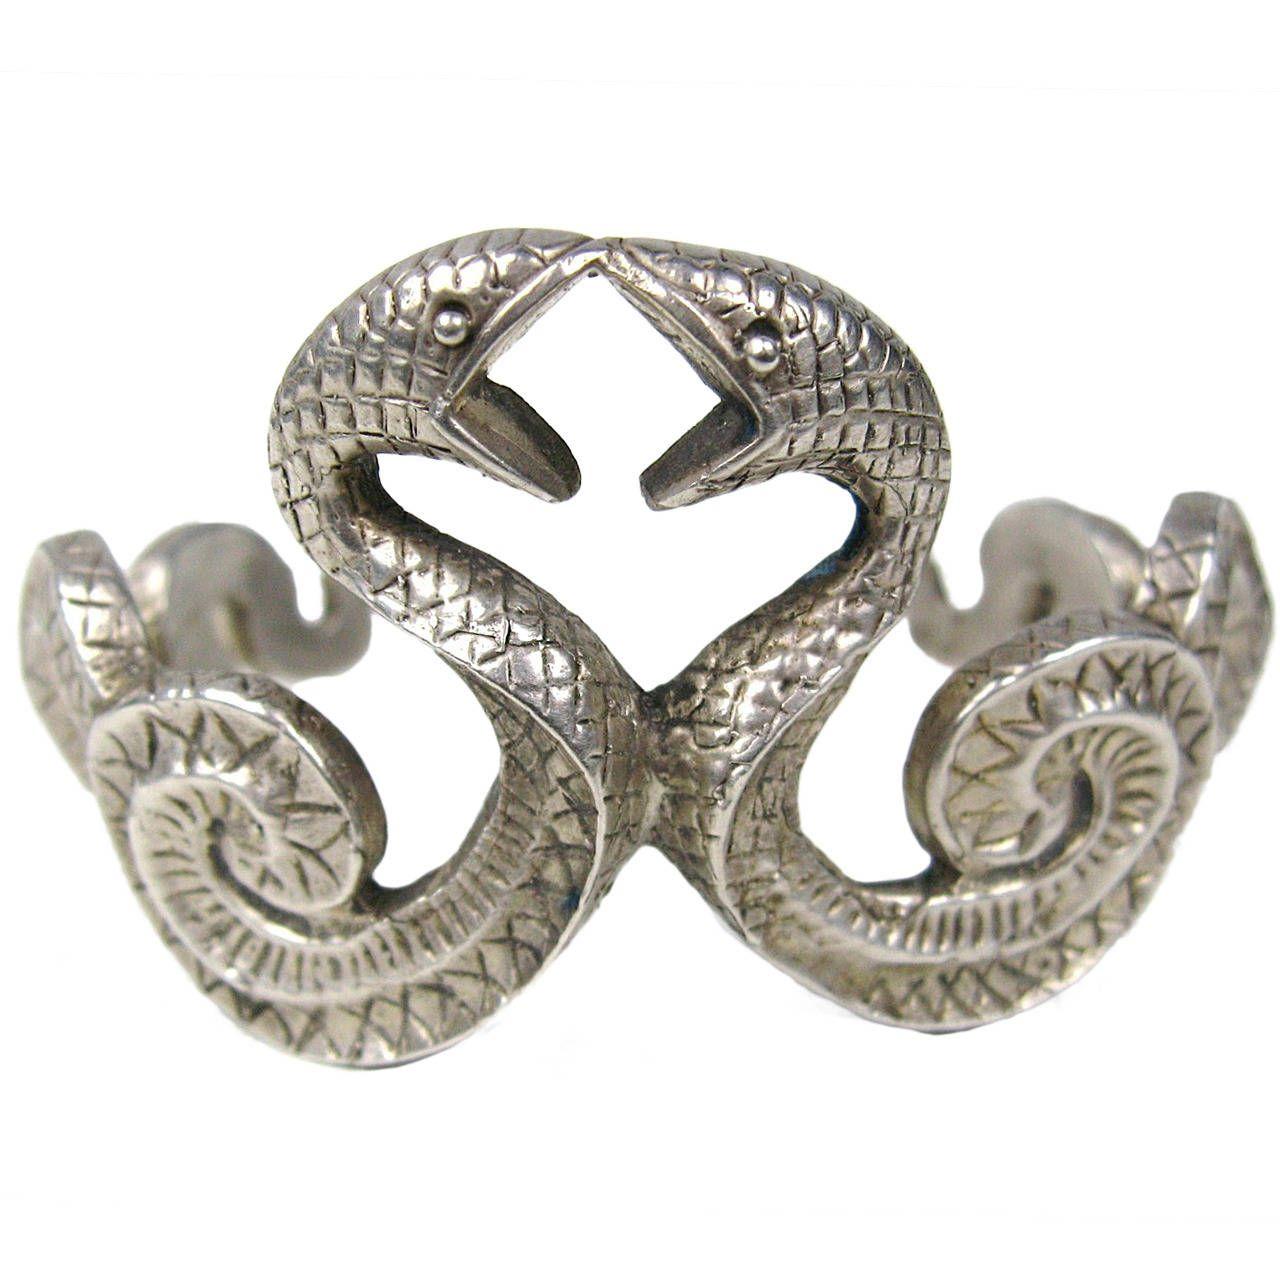 Double Snake BRACELET 925 Sterling Silver Goth | From a unique collection of vintage cuff bracelets at https://www.1stdibs.com/jewelry/bracelets/cuff-bracelets/